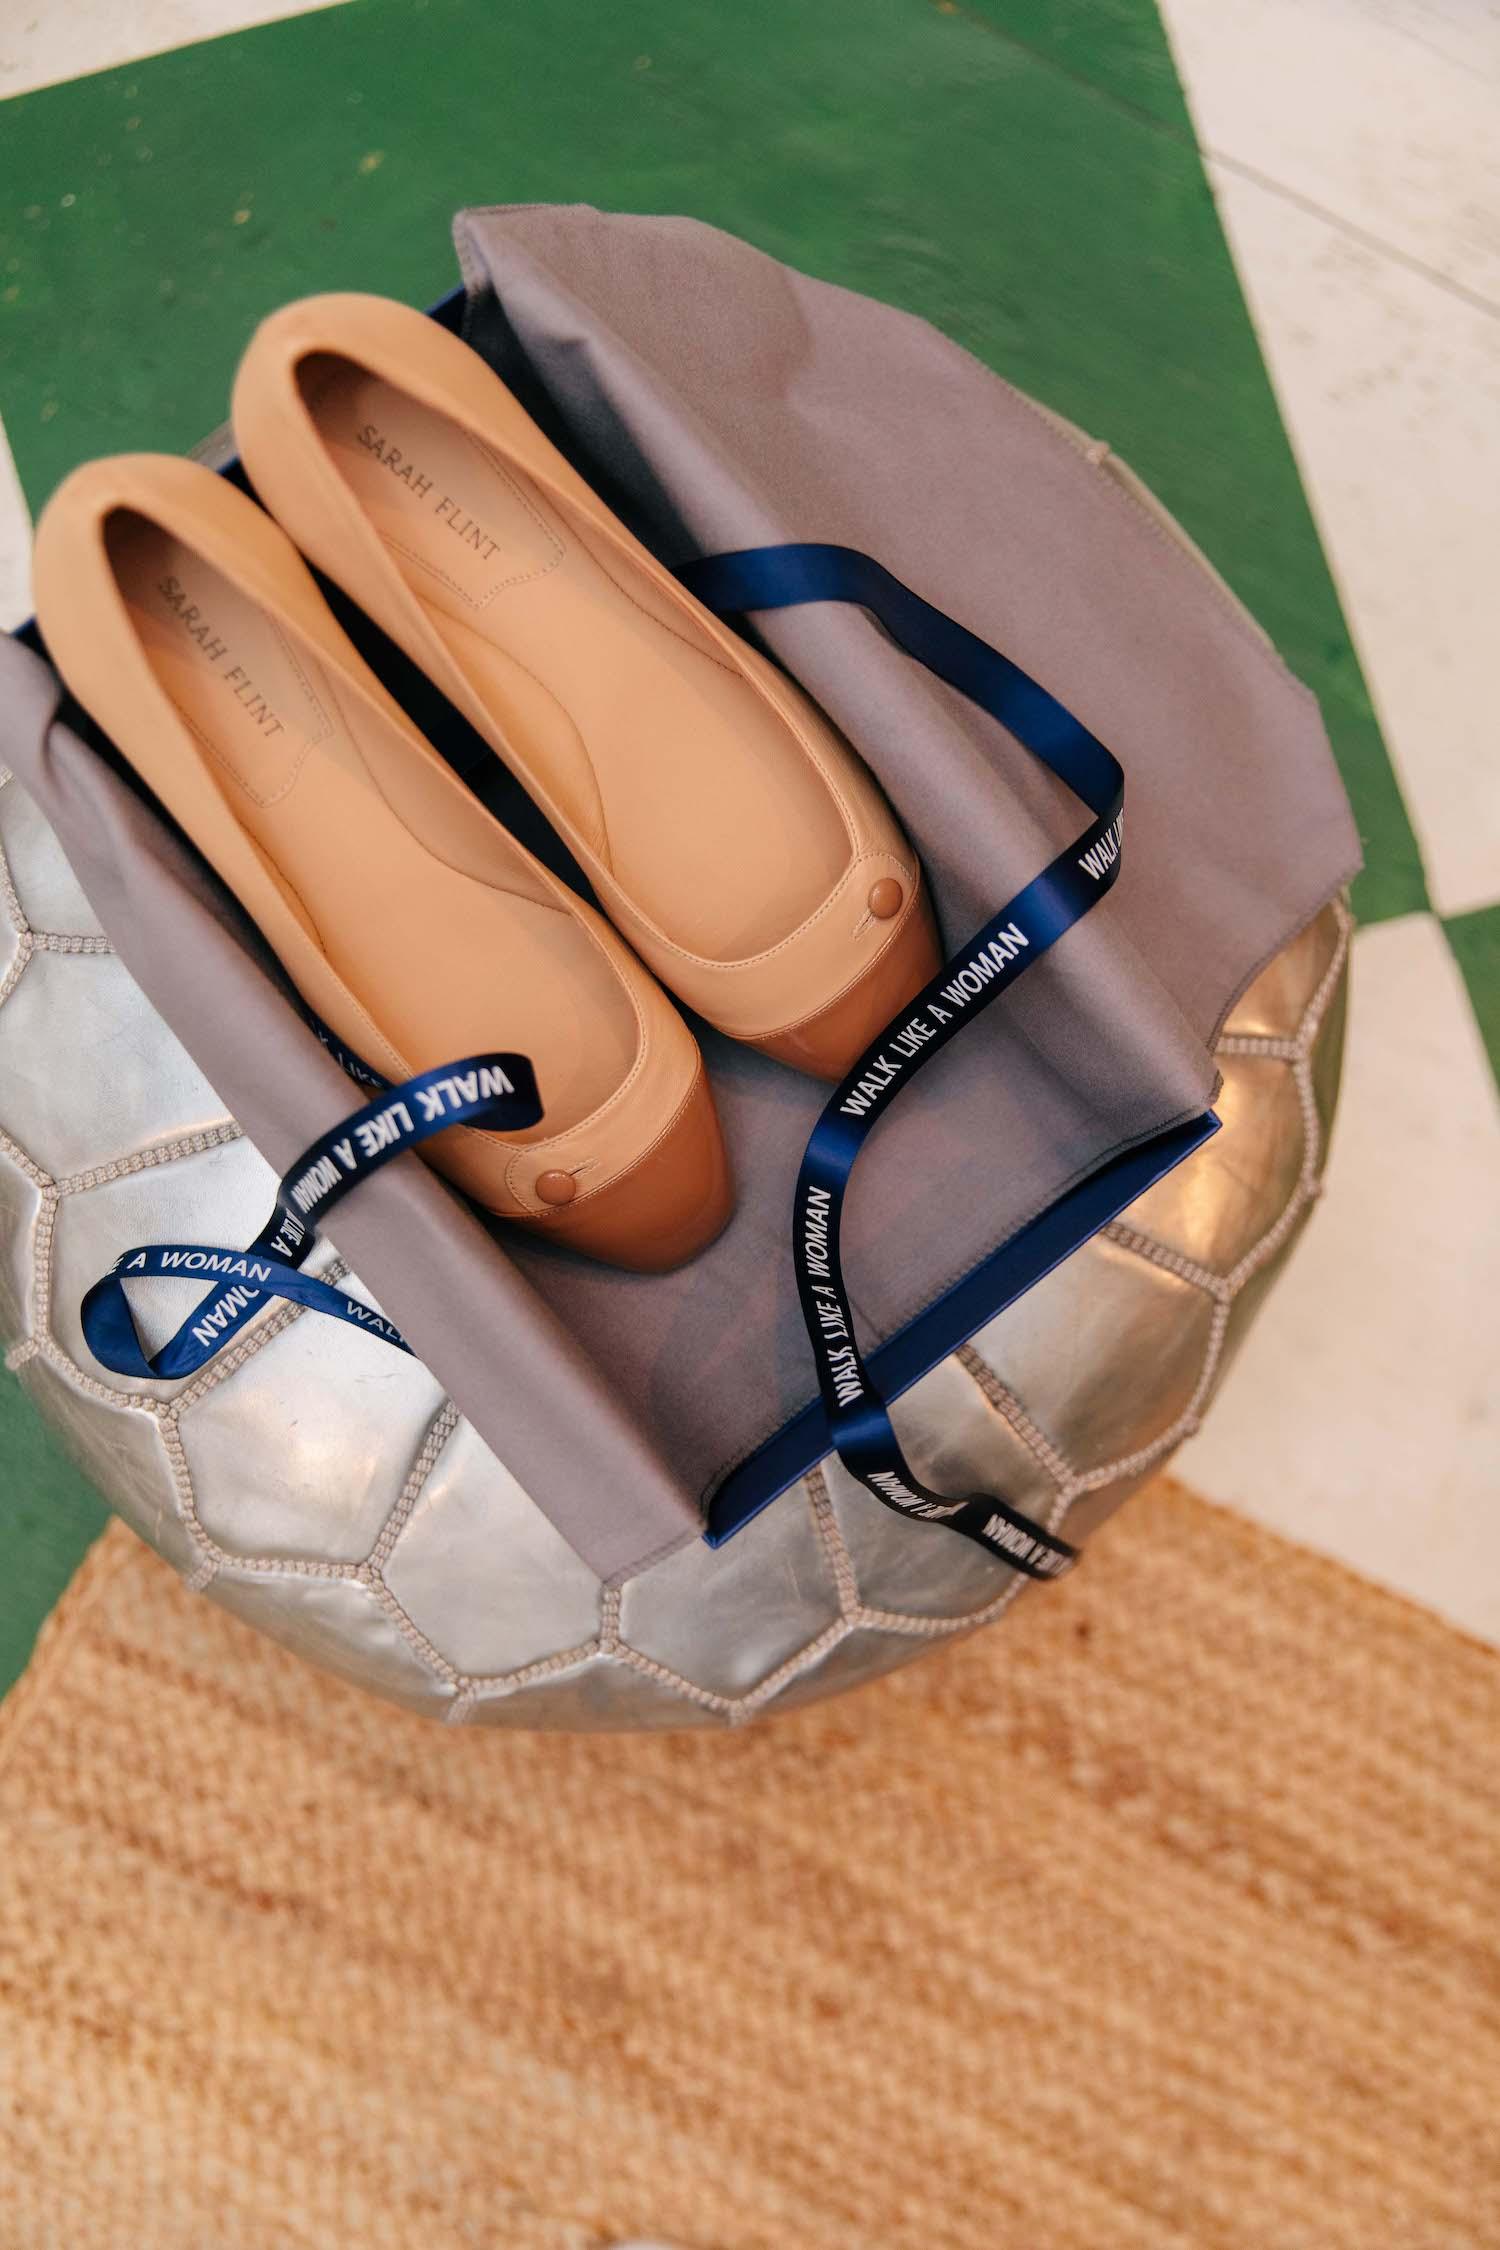 Sarah Flint flat shoes review